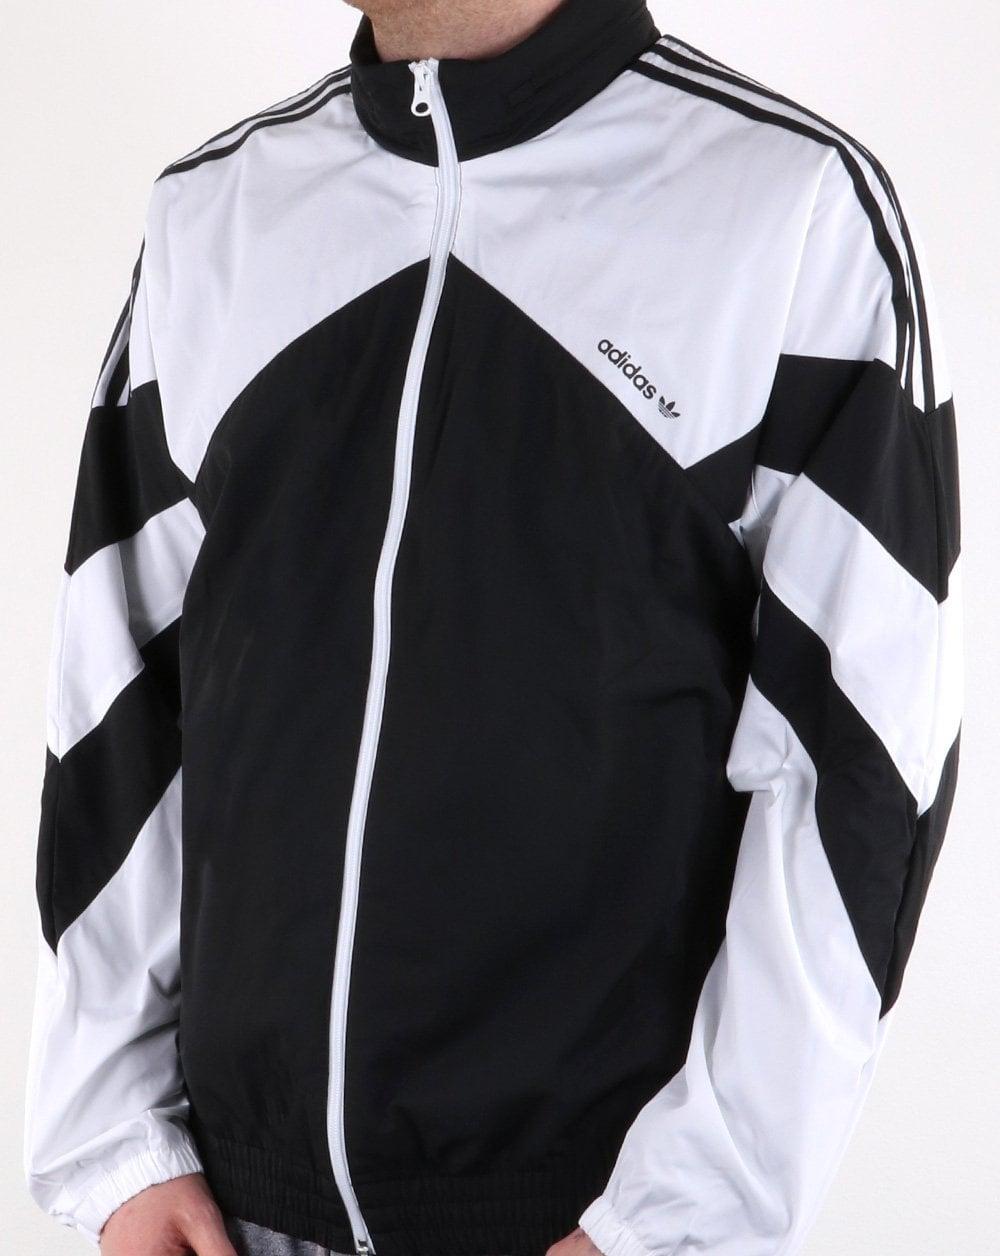 9ea5bd9b29 Adidas Originals Palmeston Windbreaker Black white